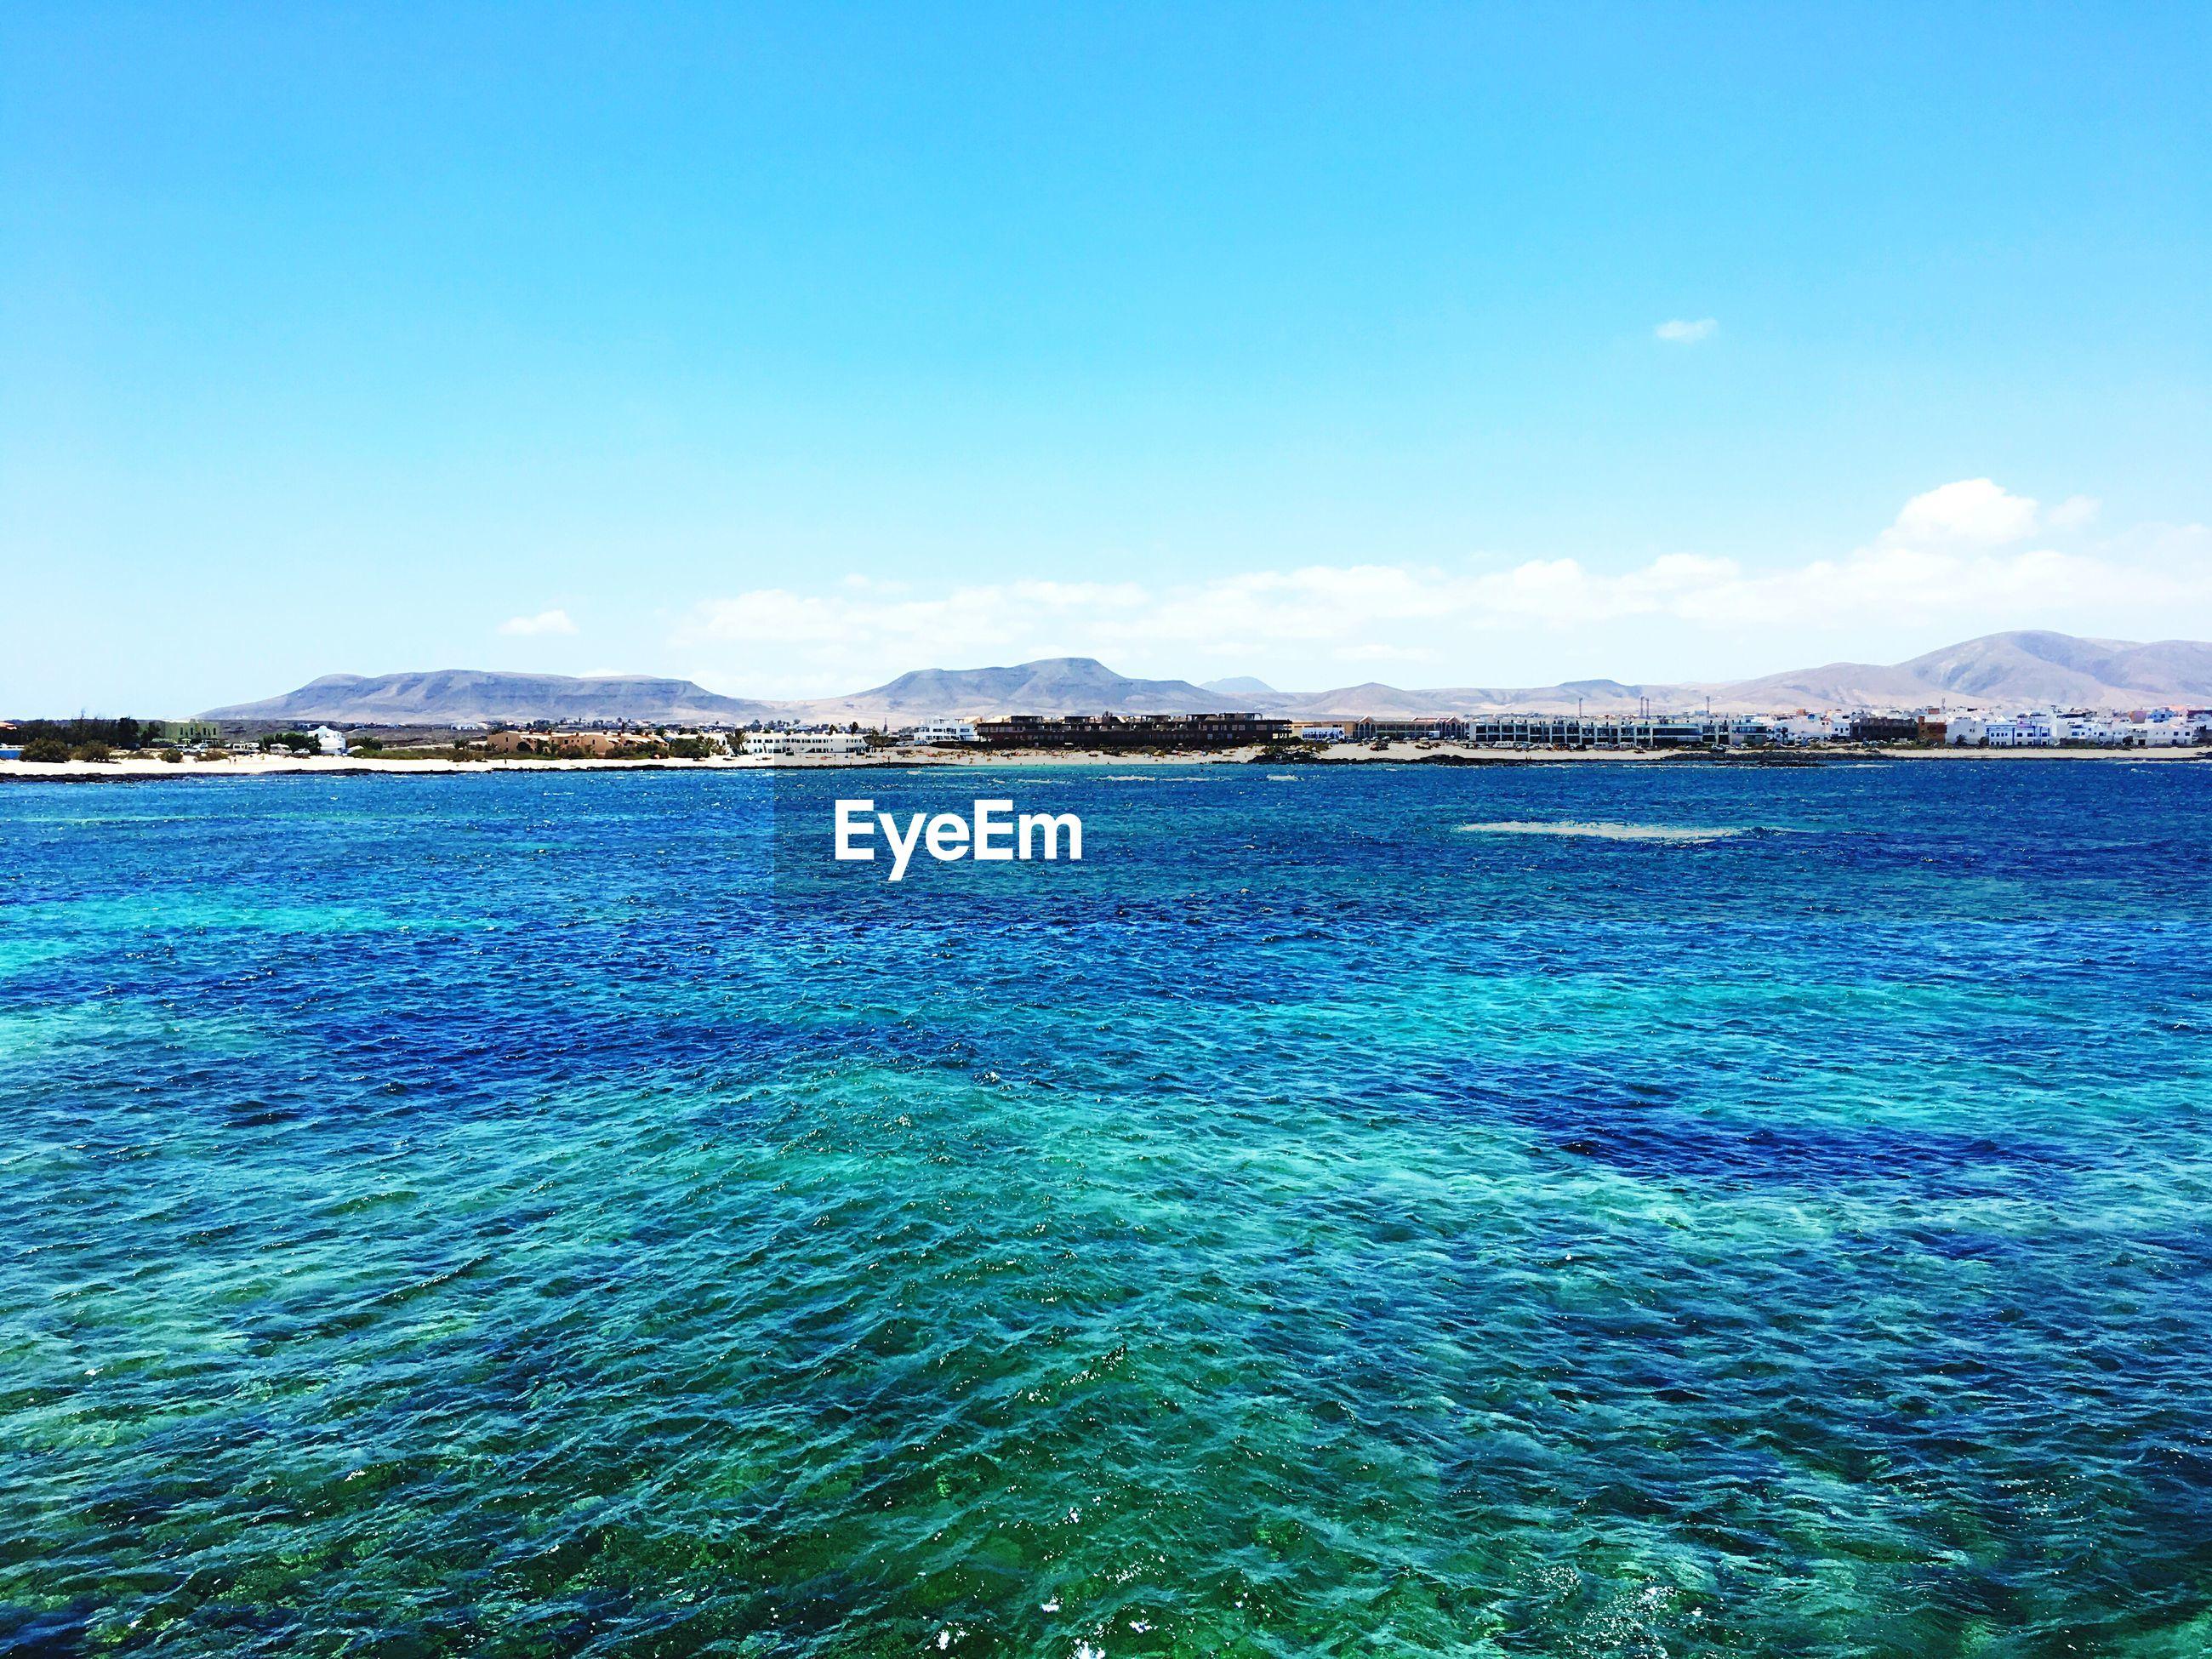 SEA AGAINST BLUE SKY